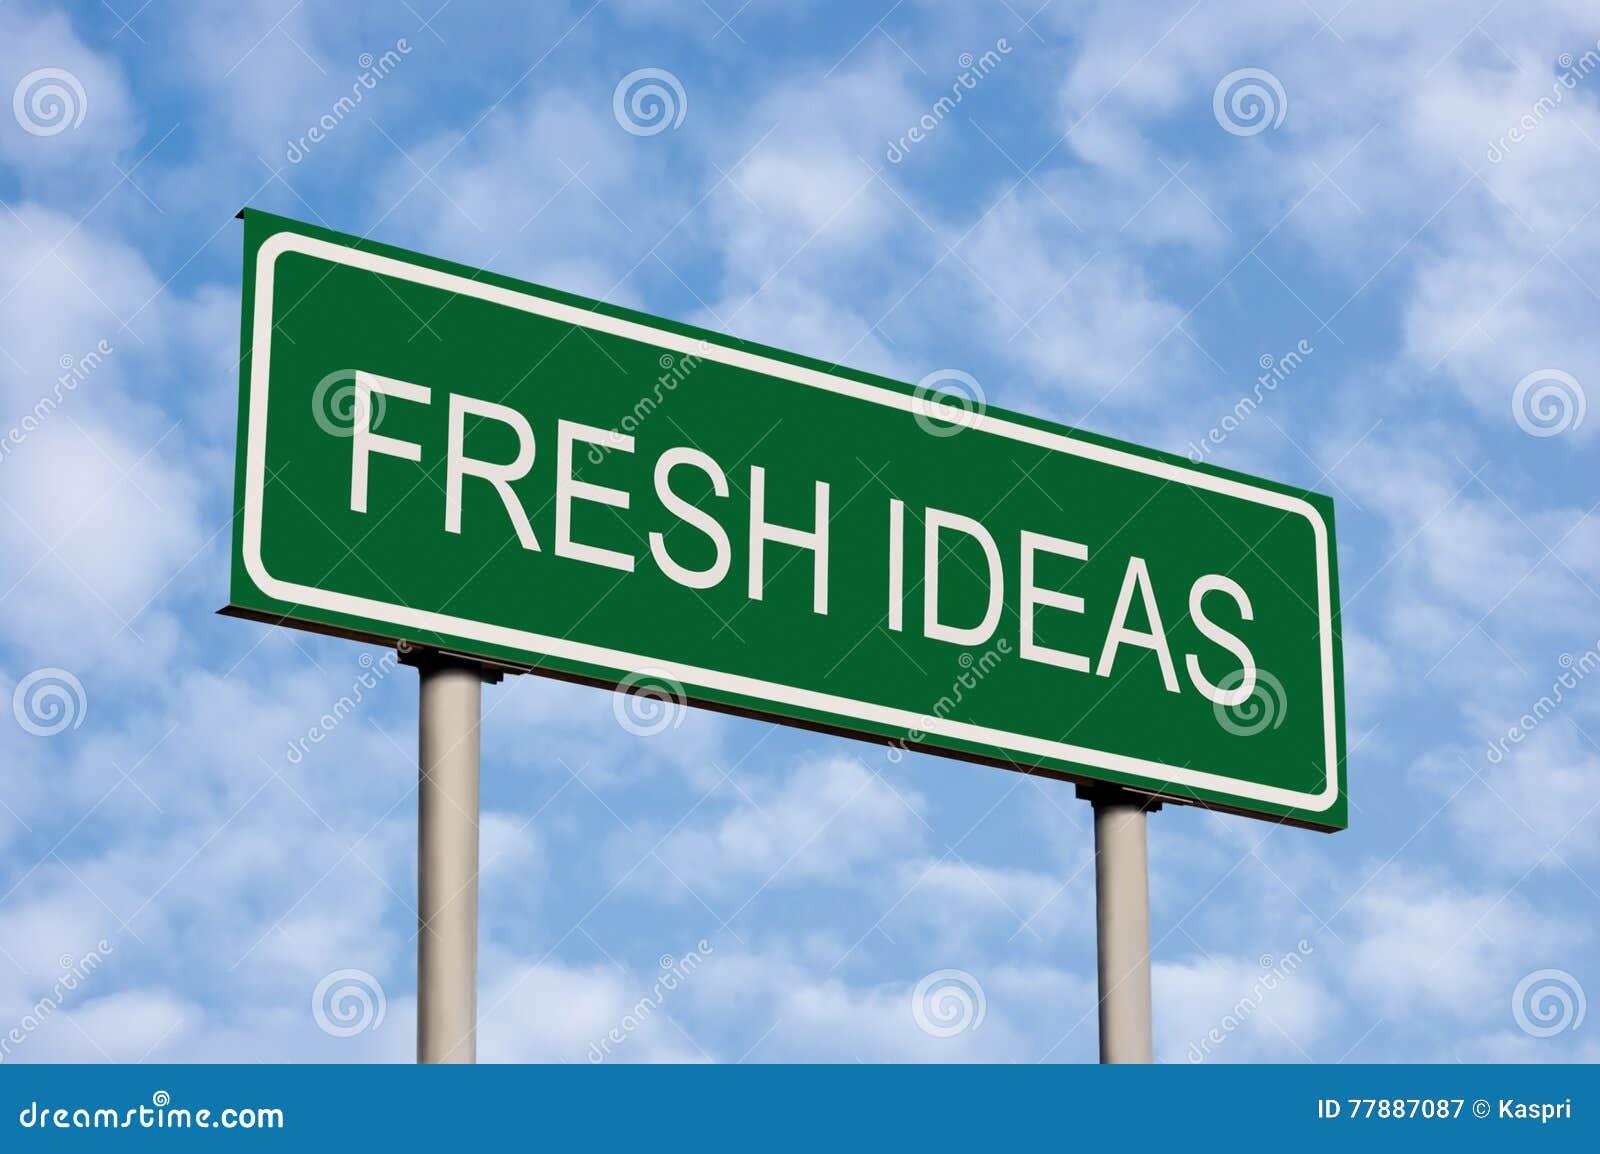 Green Road Sign Fresh Ideas Text Concept Bright Cloudscape Sky